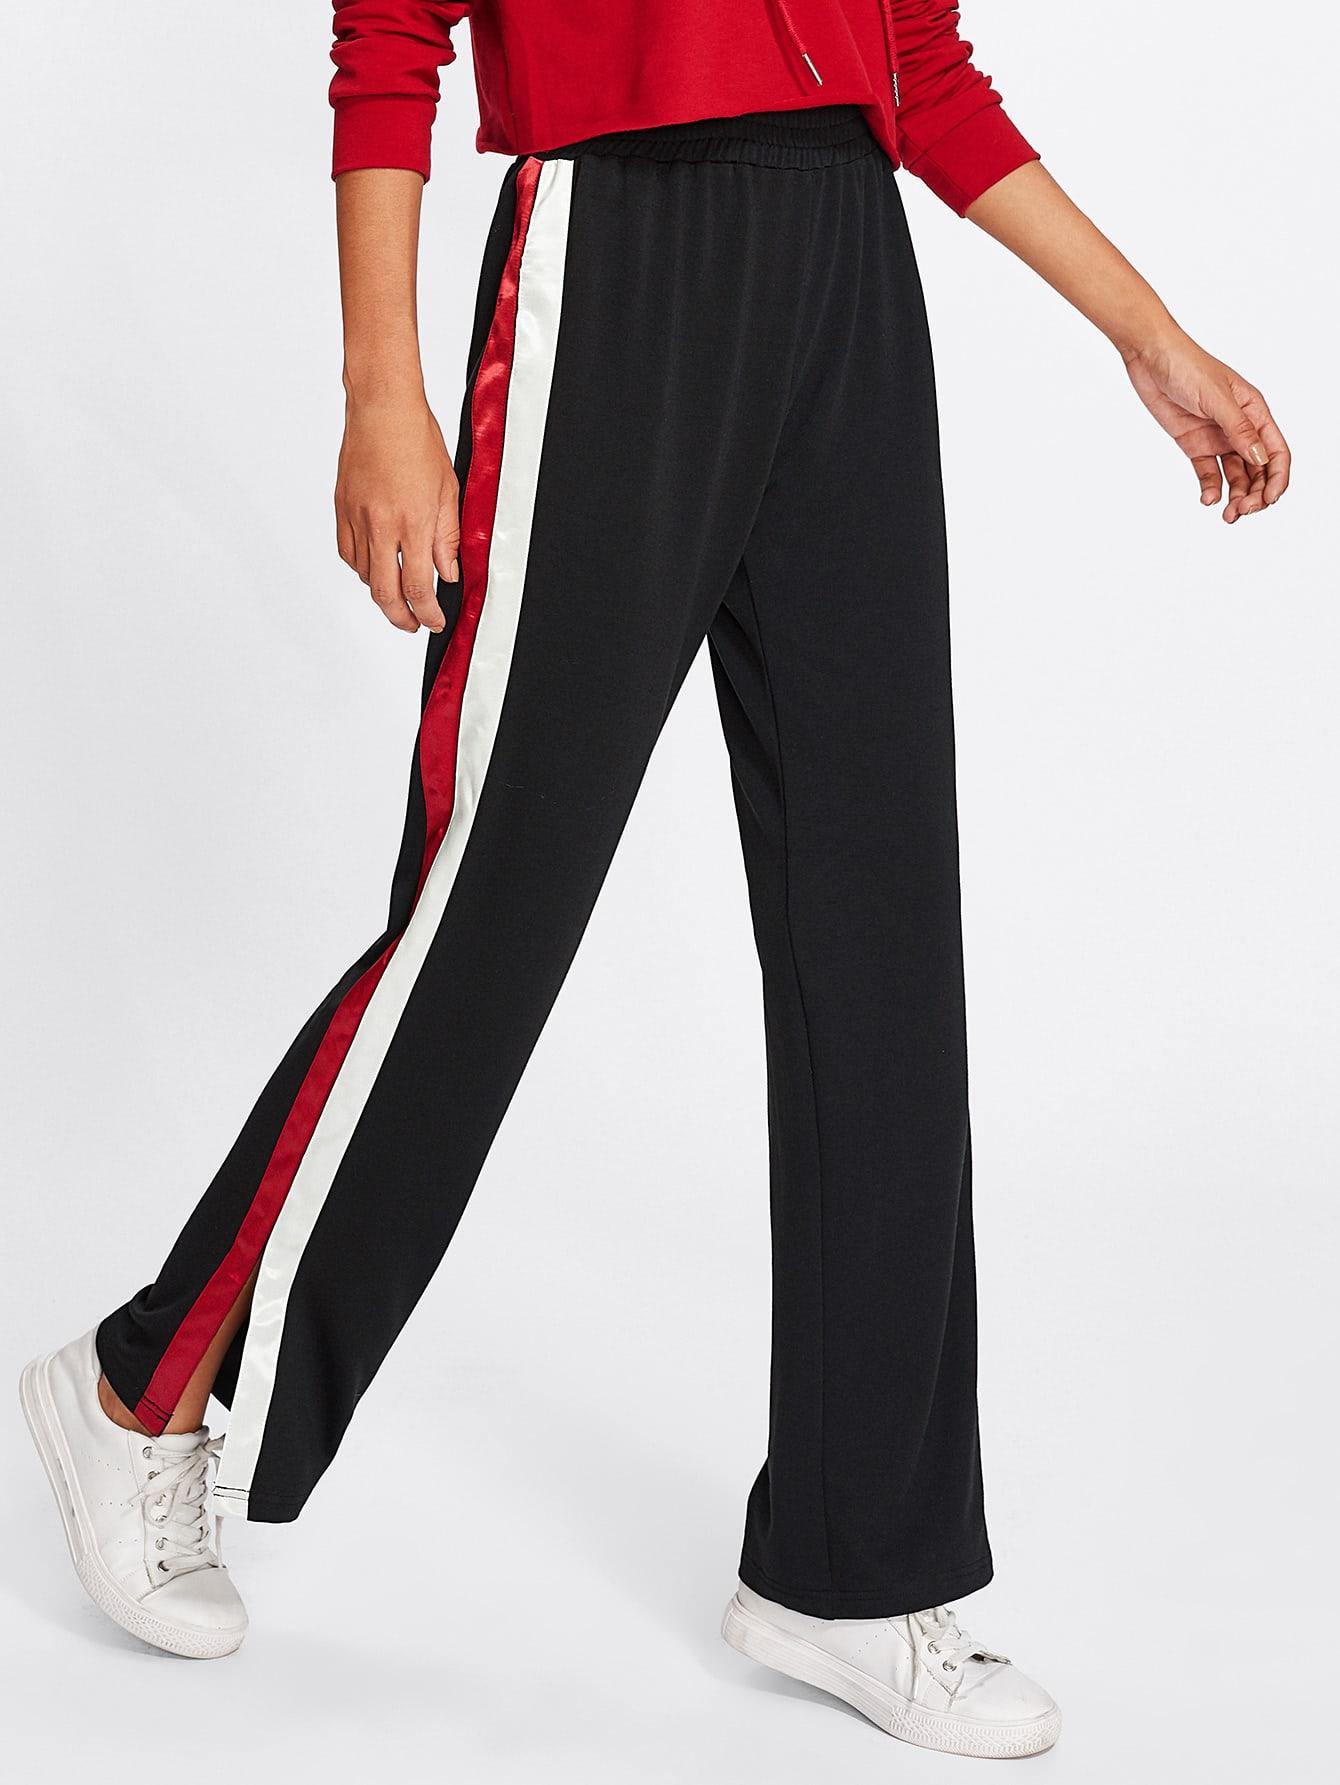 Striped Slit Side Pants striped side track pants